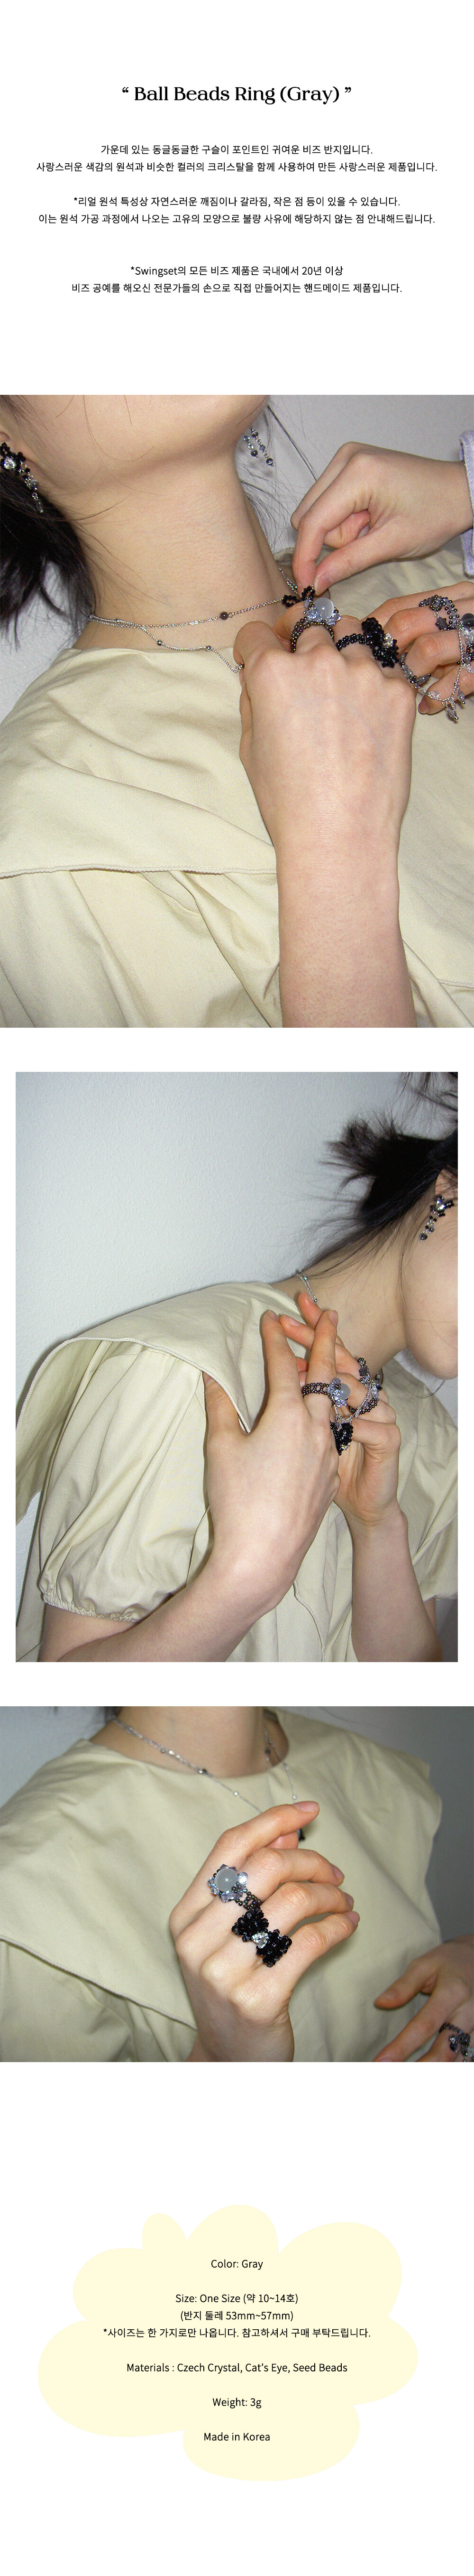 Ball Beads Ring (Gray)